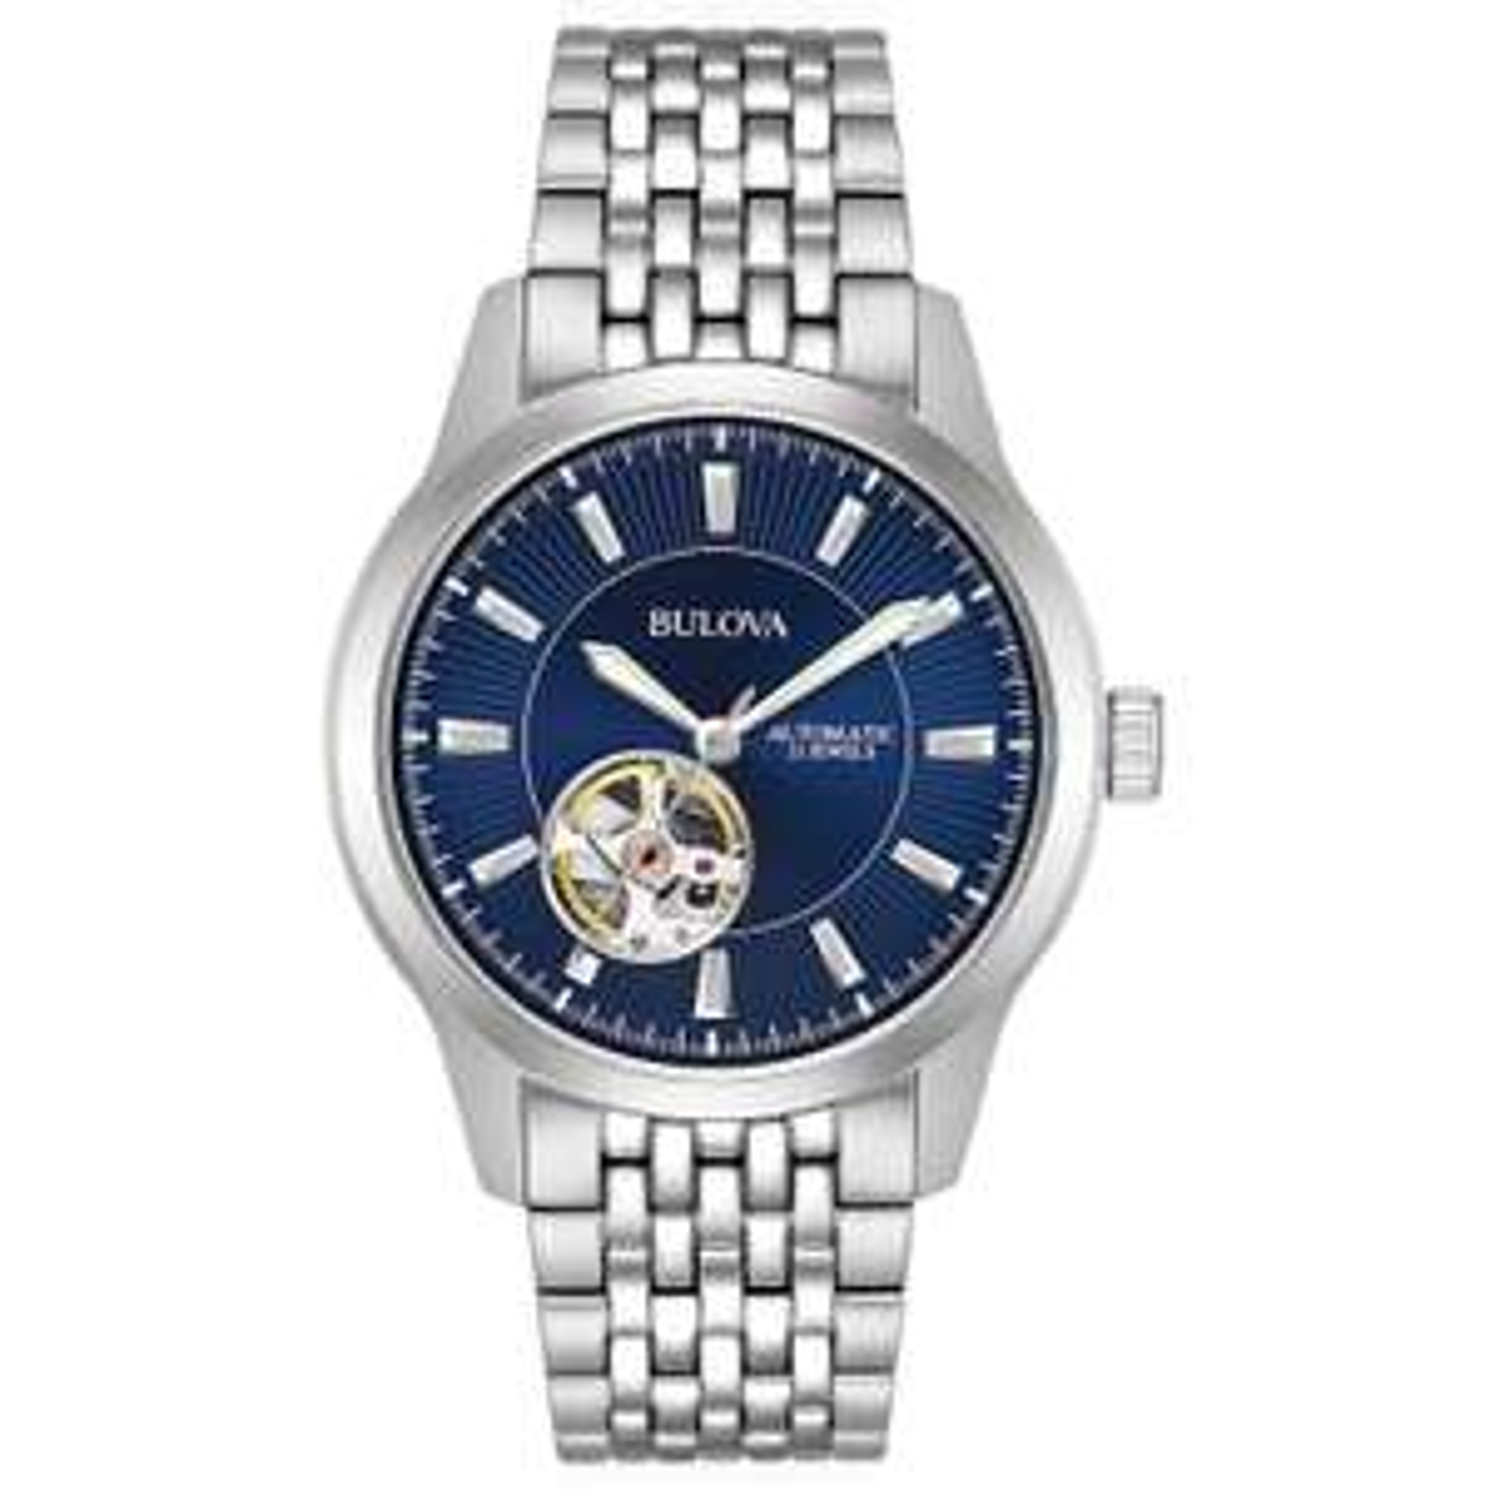 Bulova Mens Automatic Watch £88.79 (With Code) & Free P&P @ H Samuel